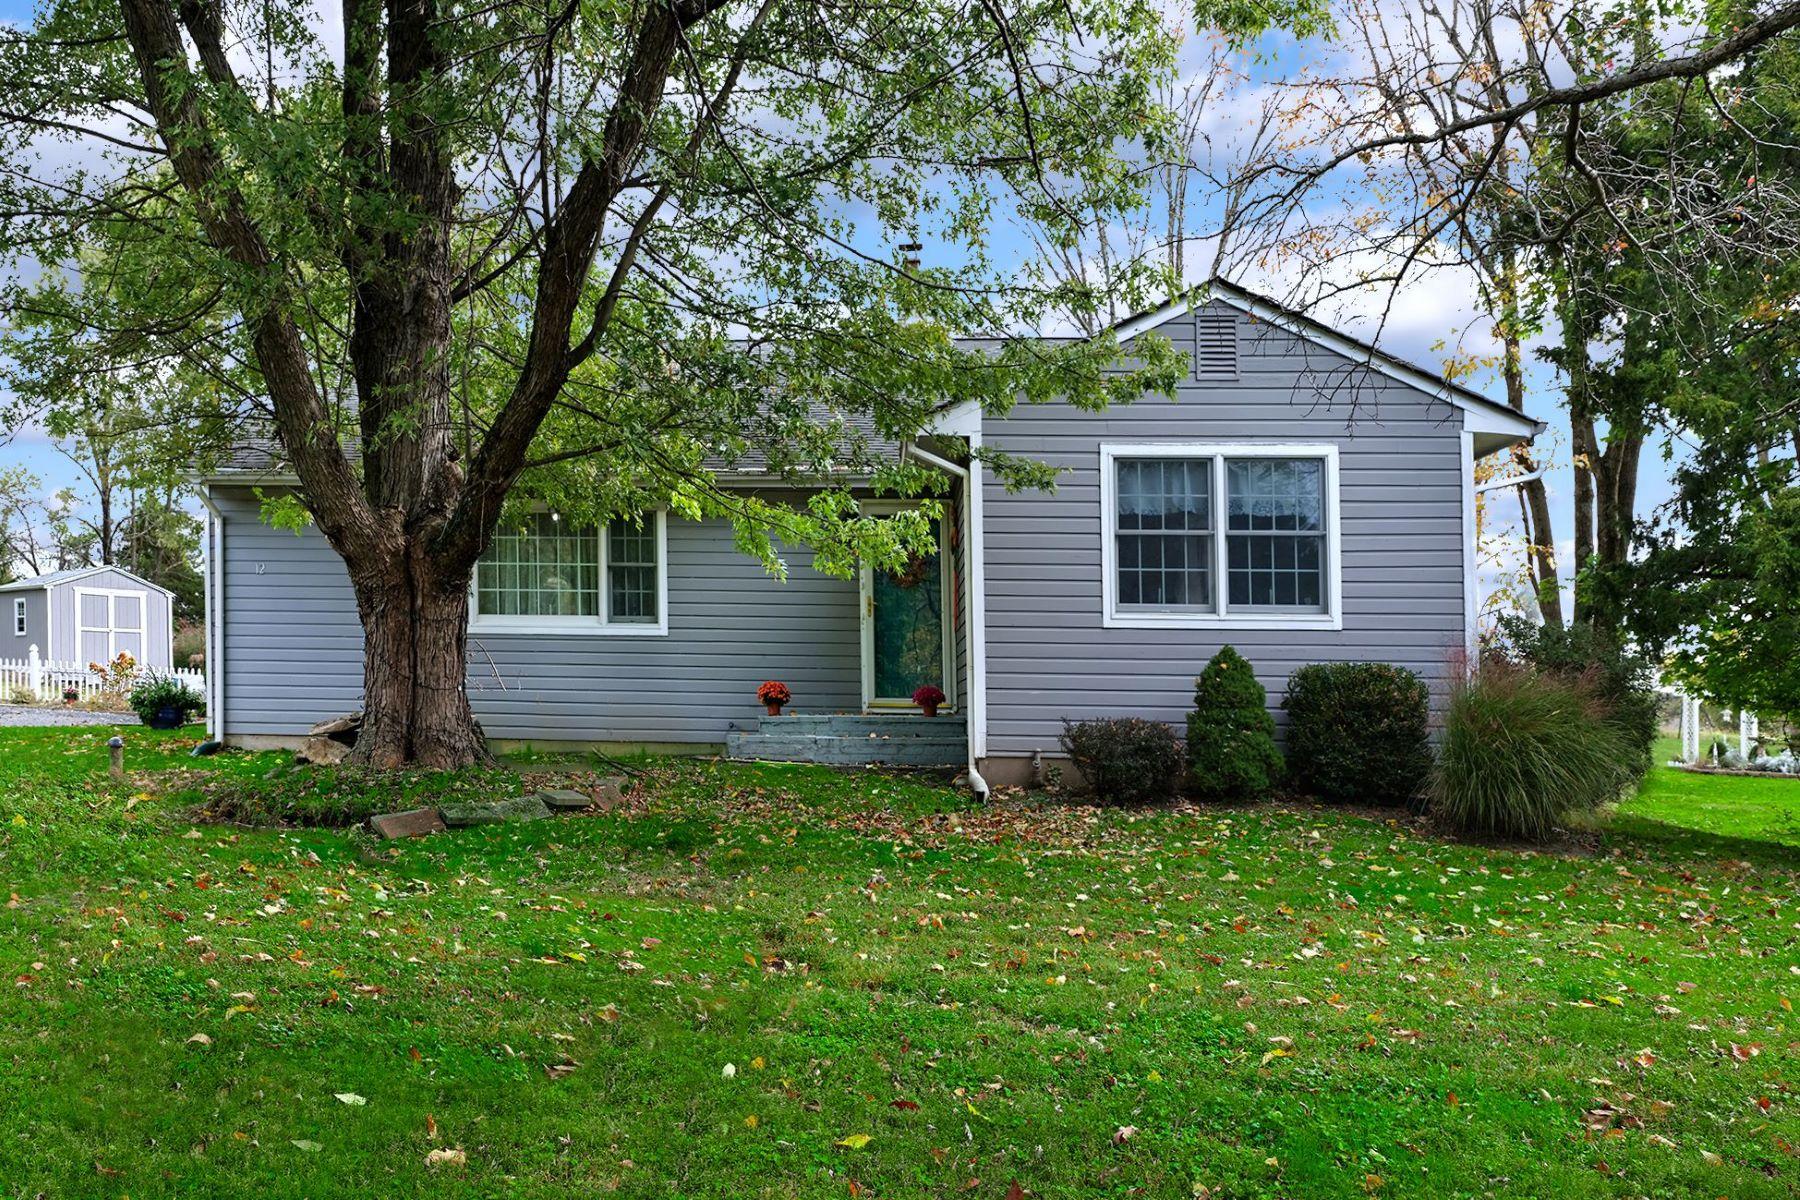 Single Family Homes για την Πώληση στο Move-In Ready Charmer Near Lambertville 12 Lake Drive, Lambertville, Νιου Τζερσεϋ 08530 Ηνωμένες Πολιτείες